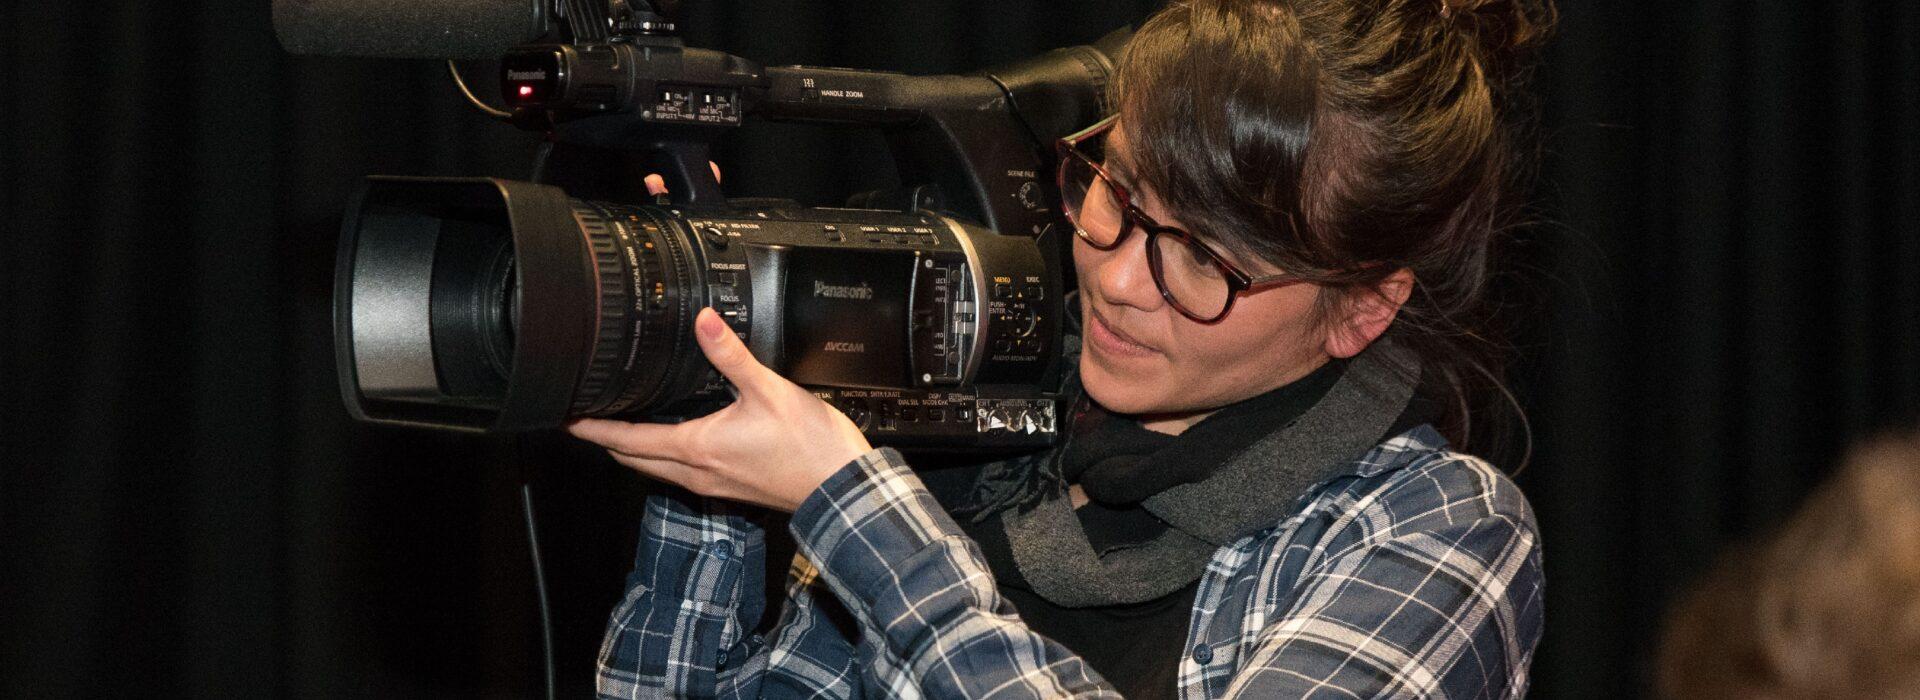 Foto: Kamerafrau mit Kamera auf Schulter